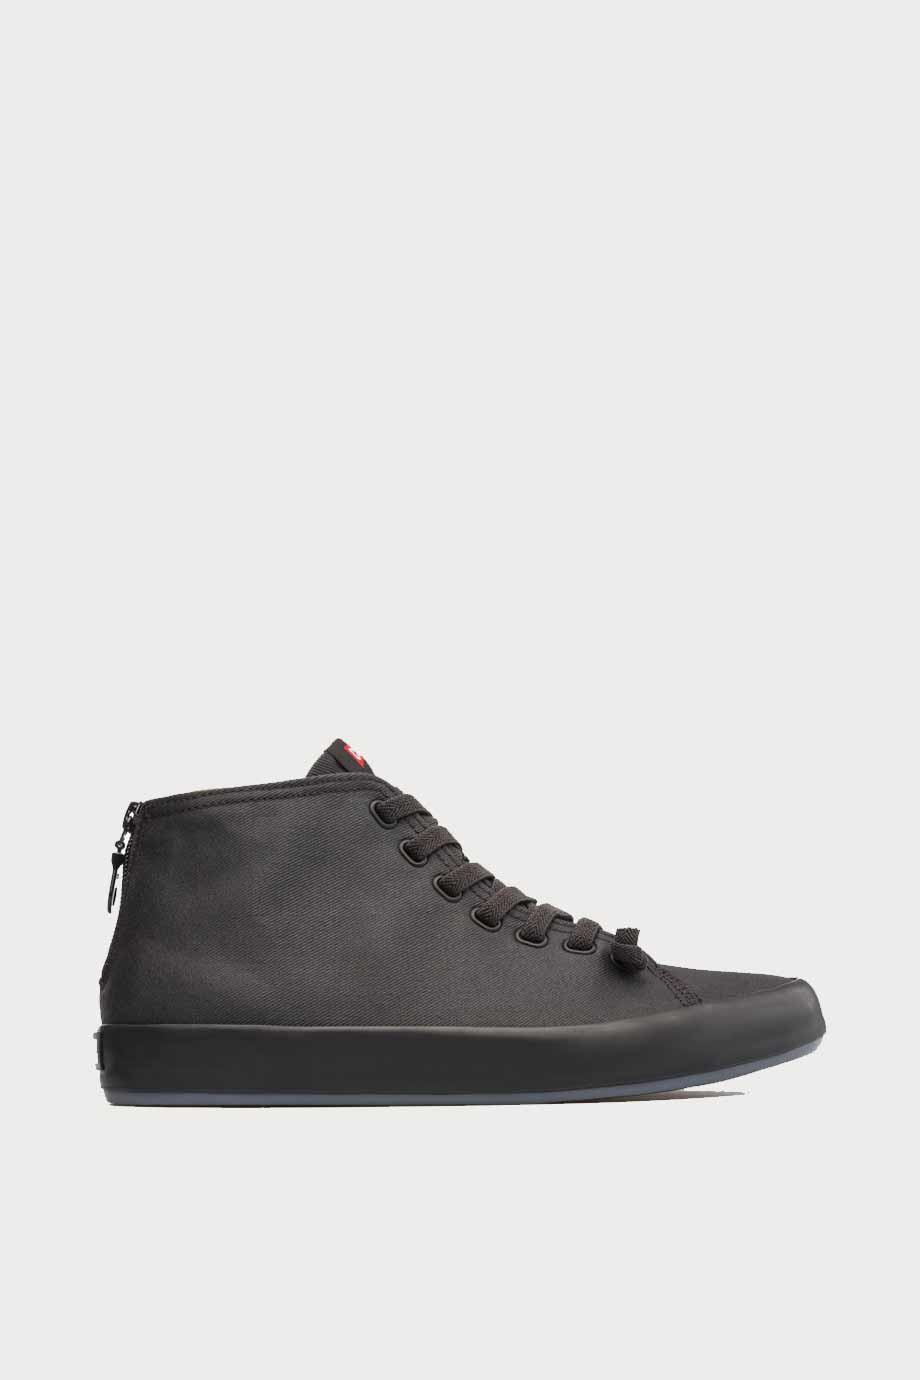 spiridoula metheniti shoes xalkida p Camper K300143 003 Andratx 3